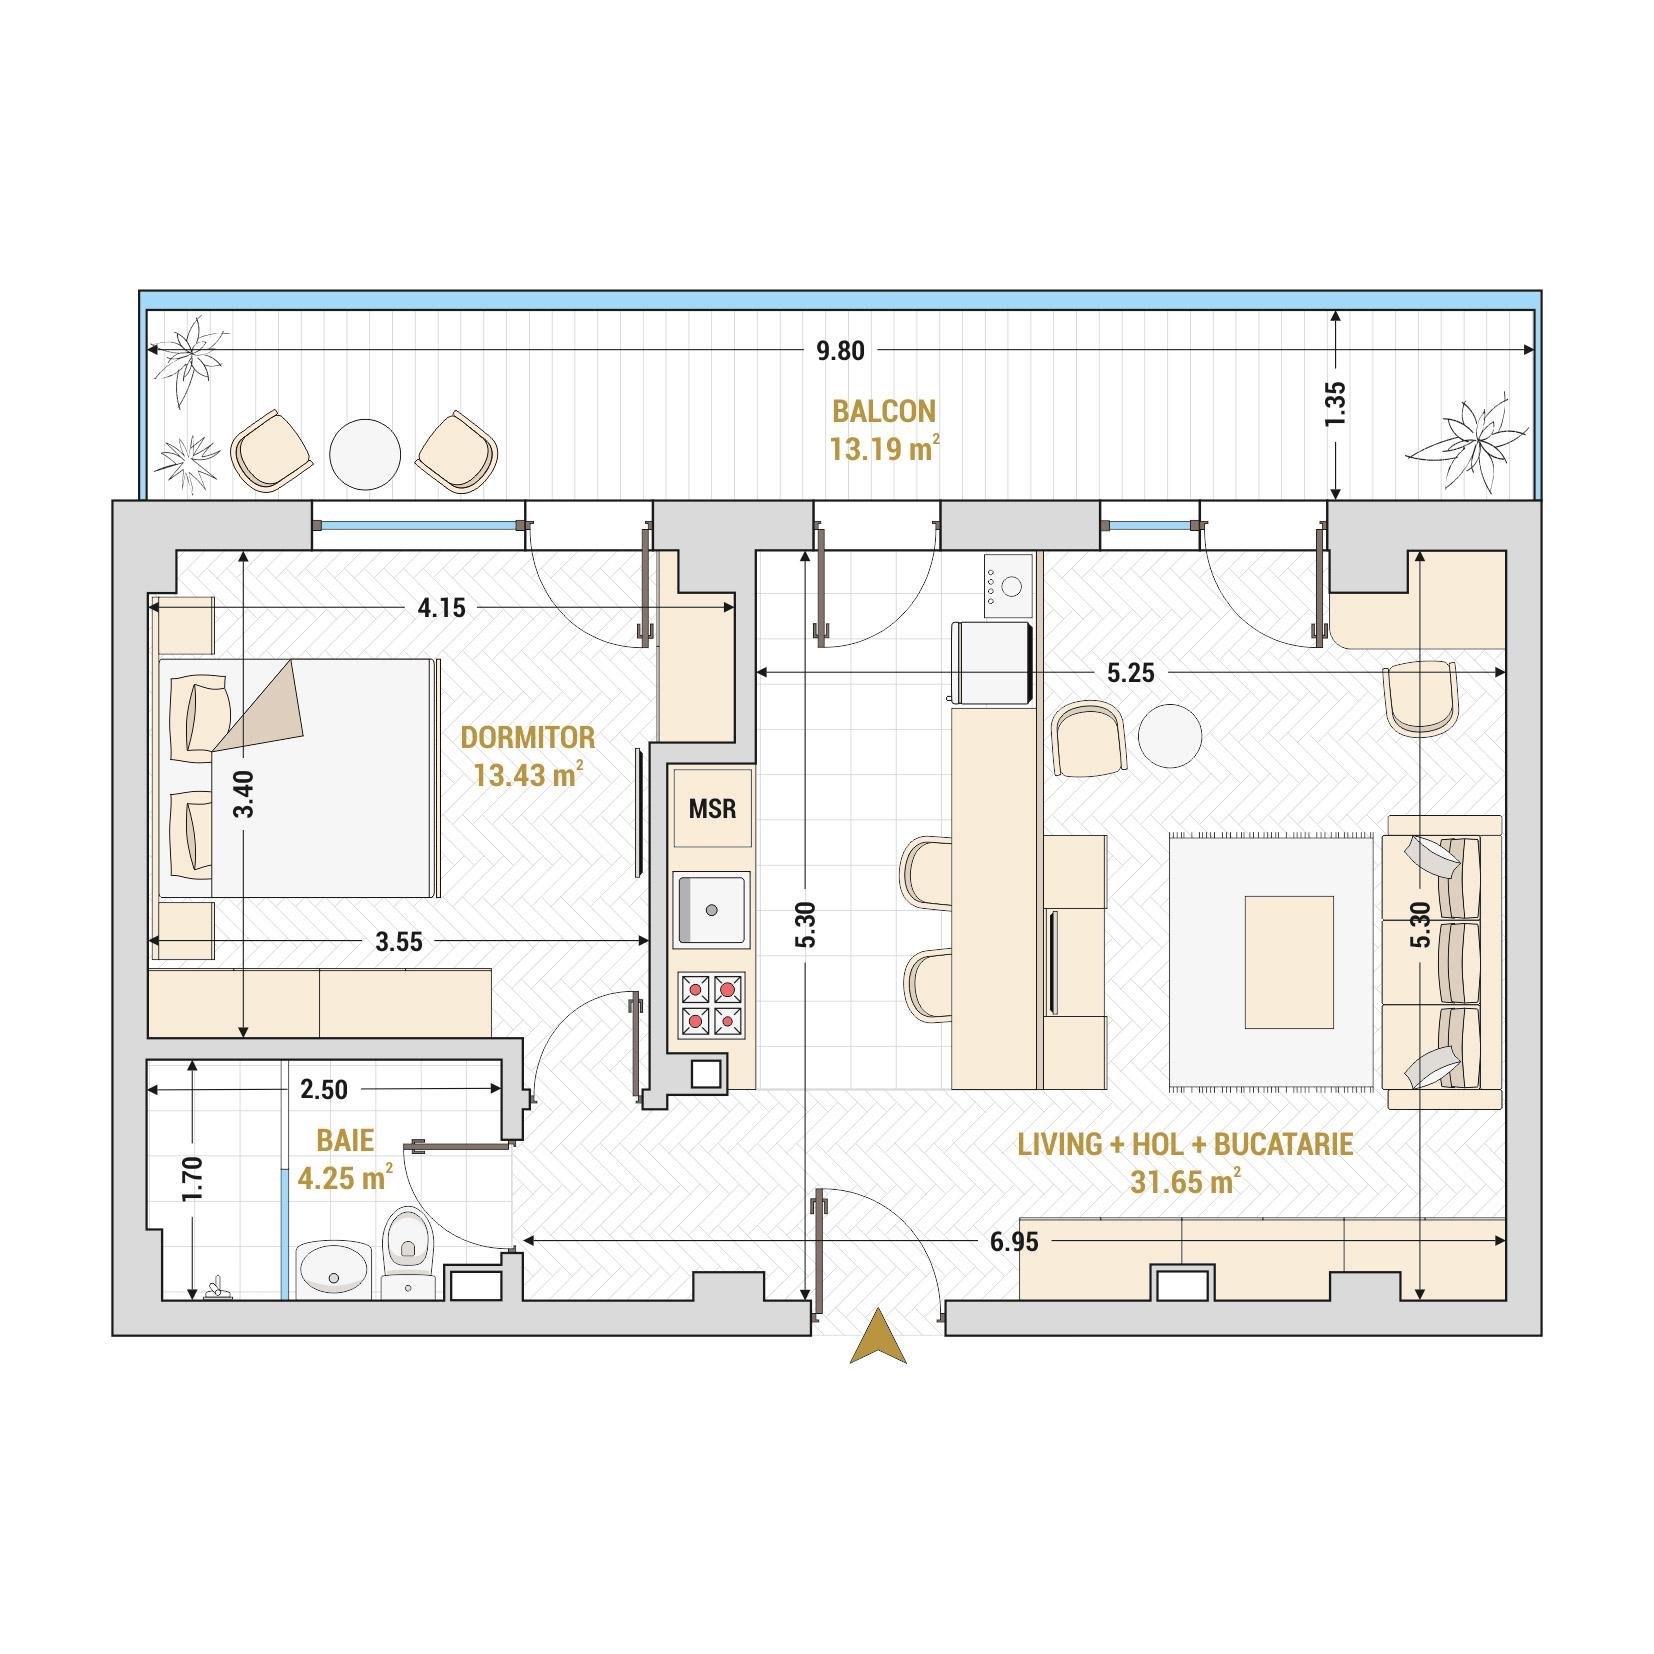 Apartamente cu 2 camere de vanzare Bucuresti - Catedral Residence - Marriott, Piata Unirii, 13 Septembrie, Izvor - Tip 6 - T1A